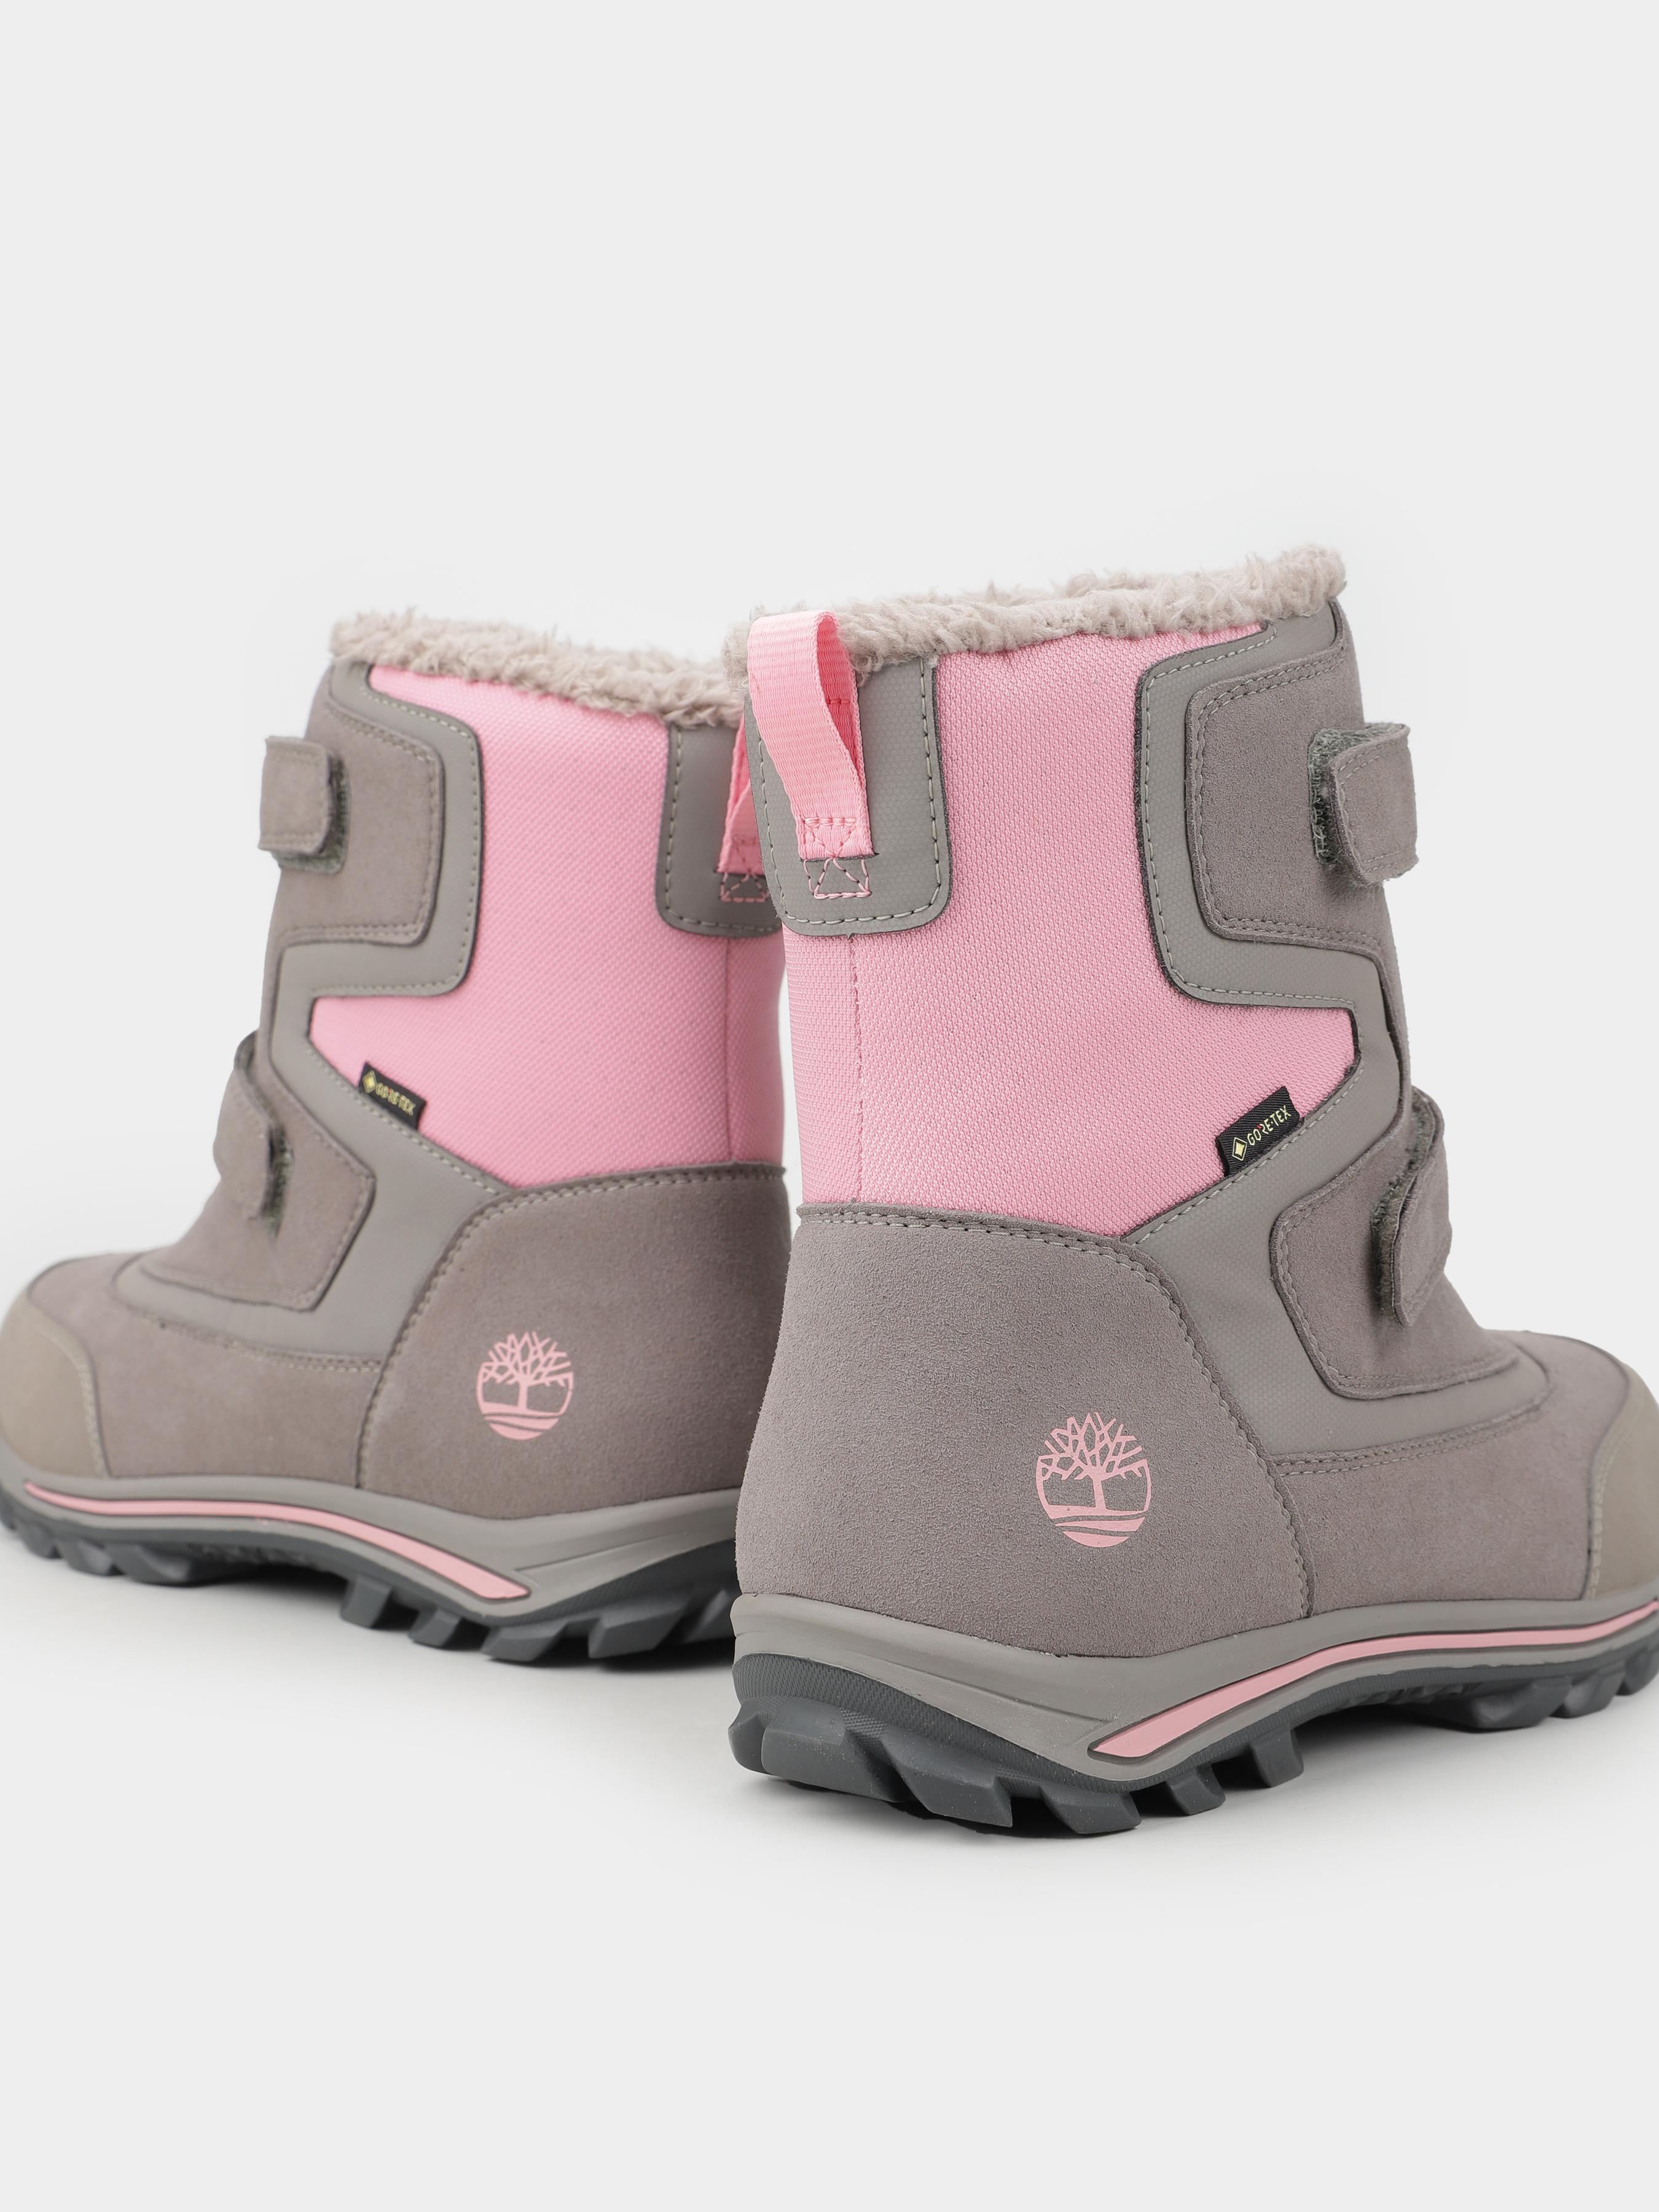 Ботинки для детей Timberland Chillberg TL1872 продажа, 2017